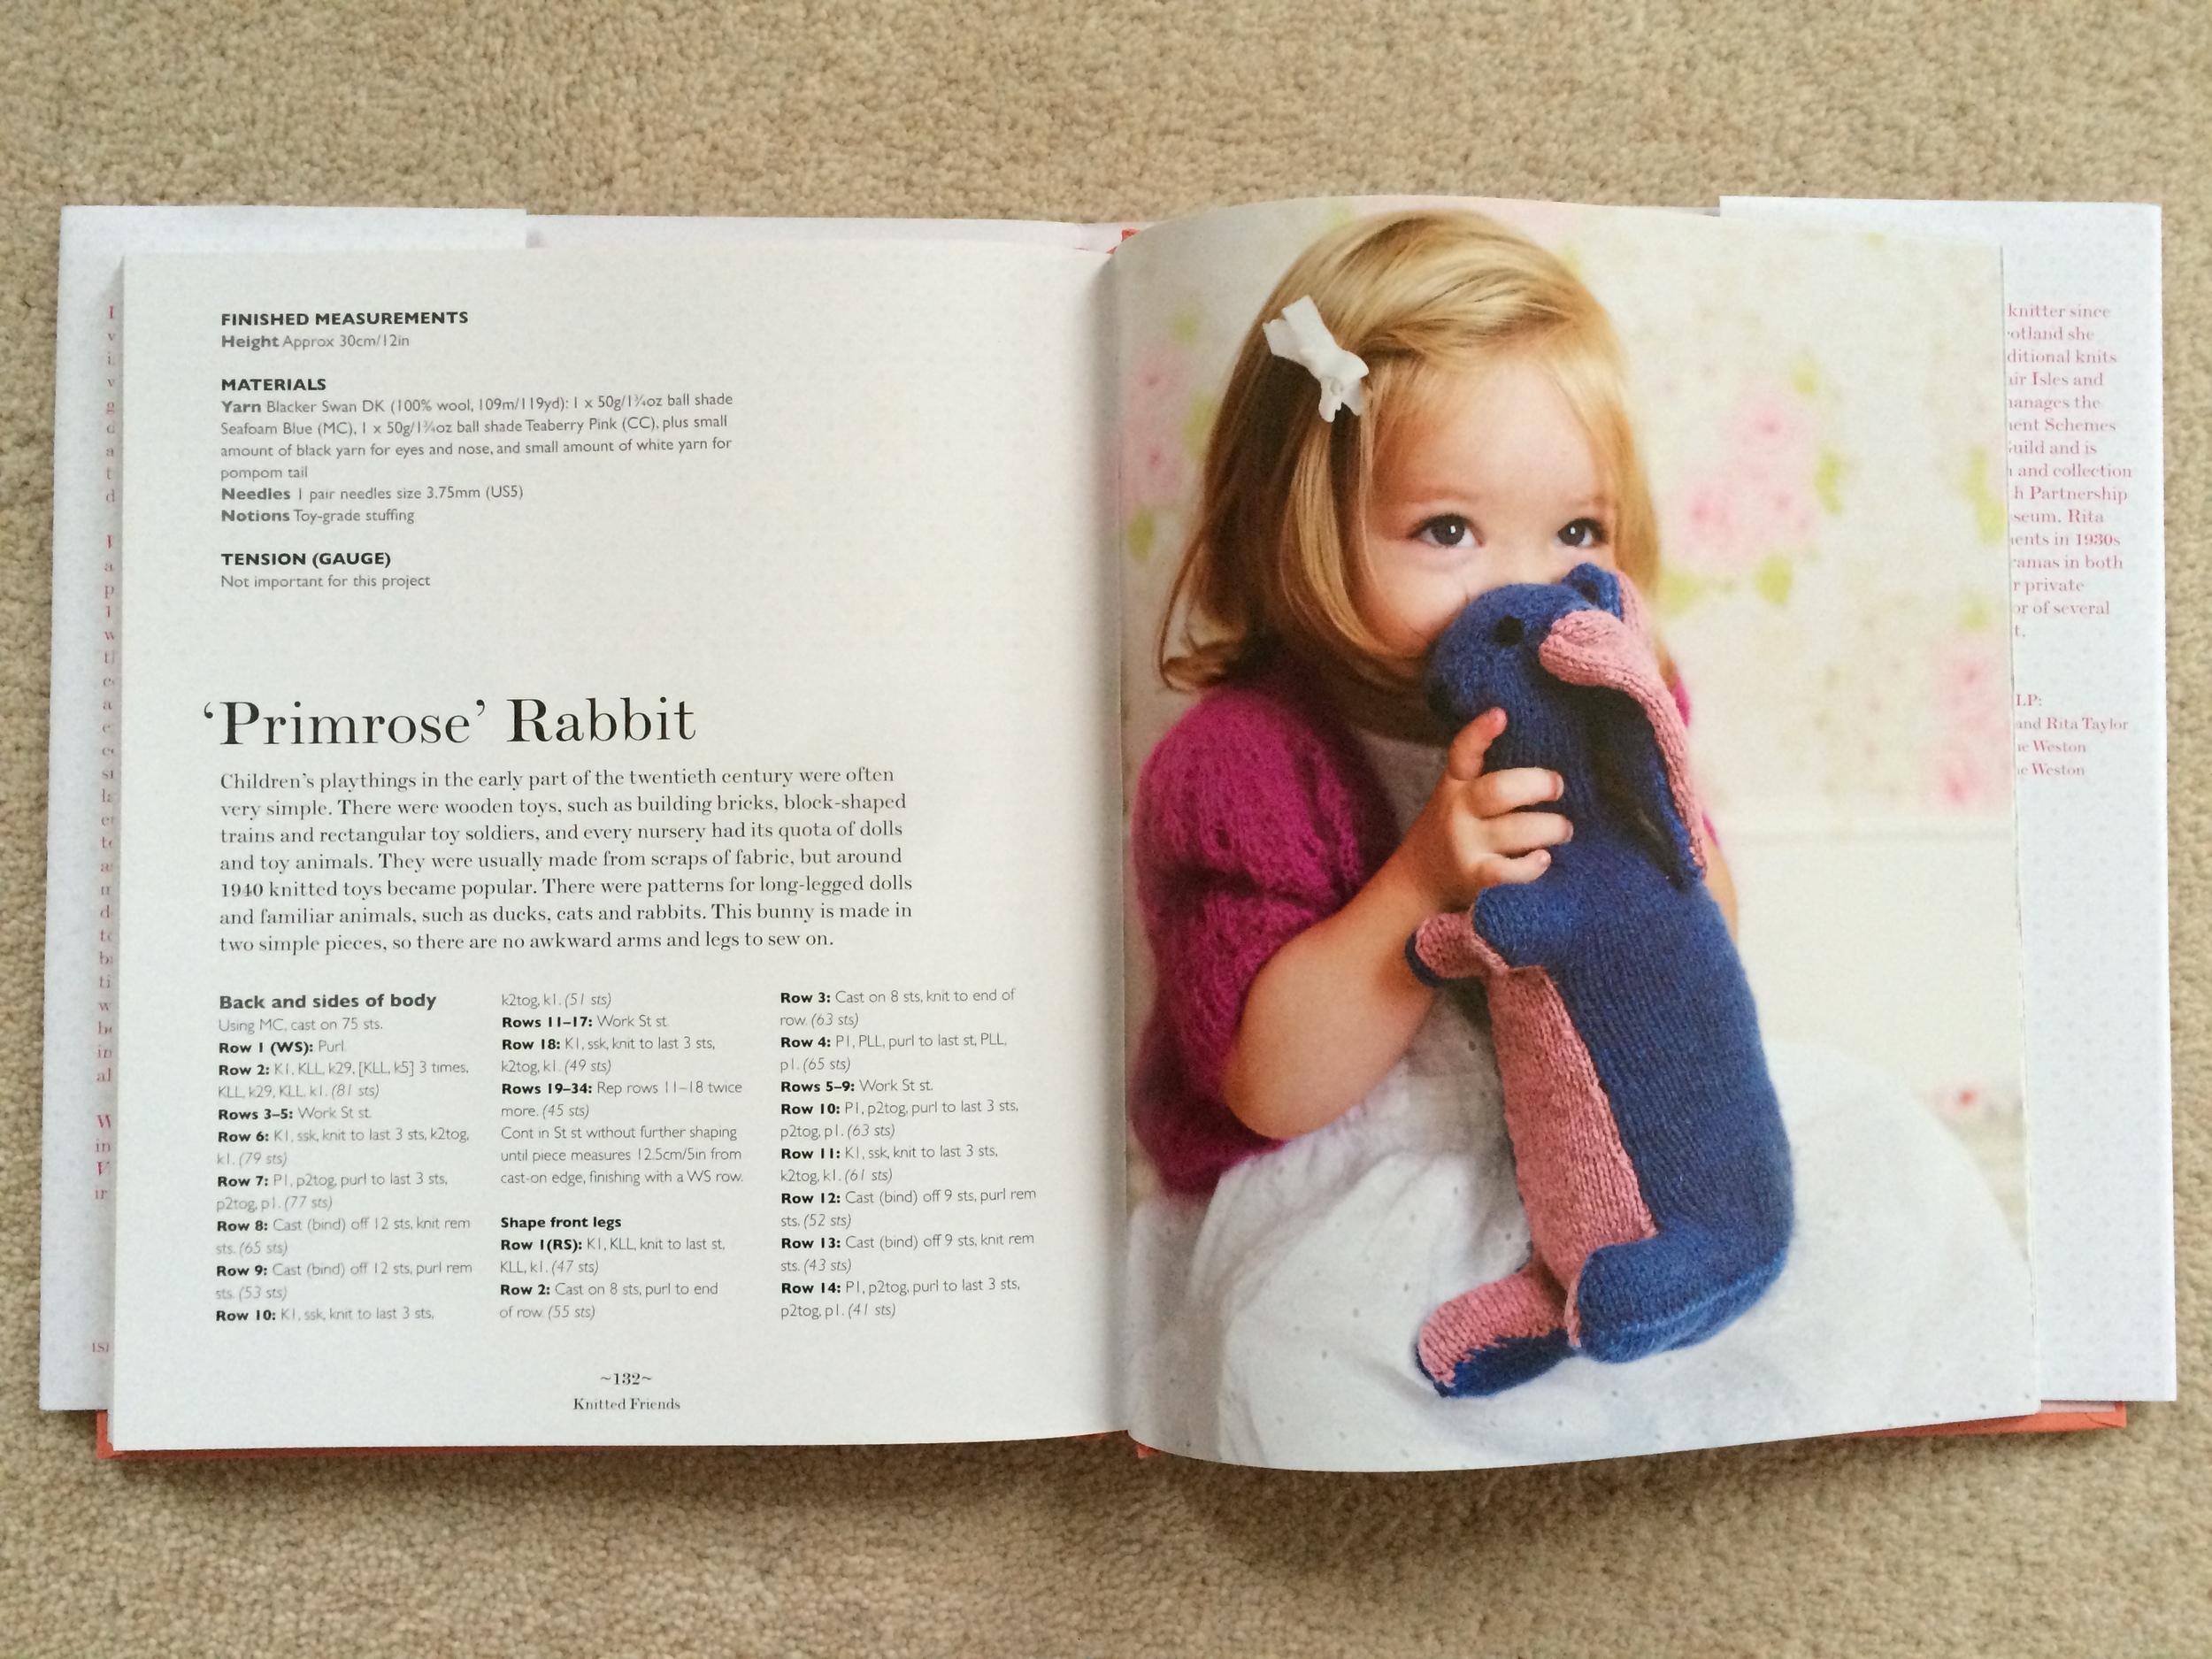 Primrose Rabbit by Rita Taylor